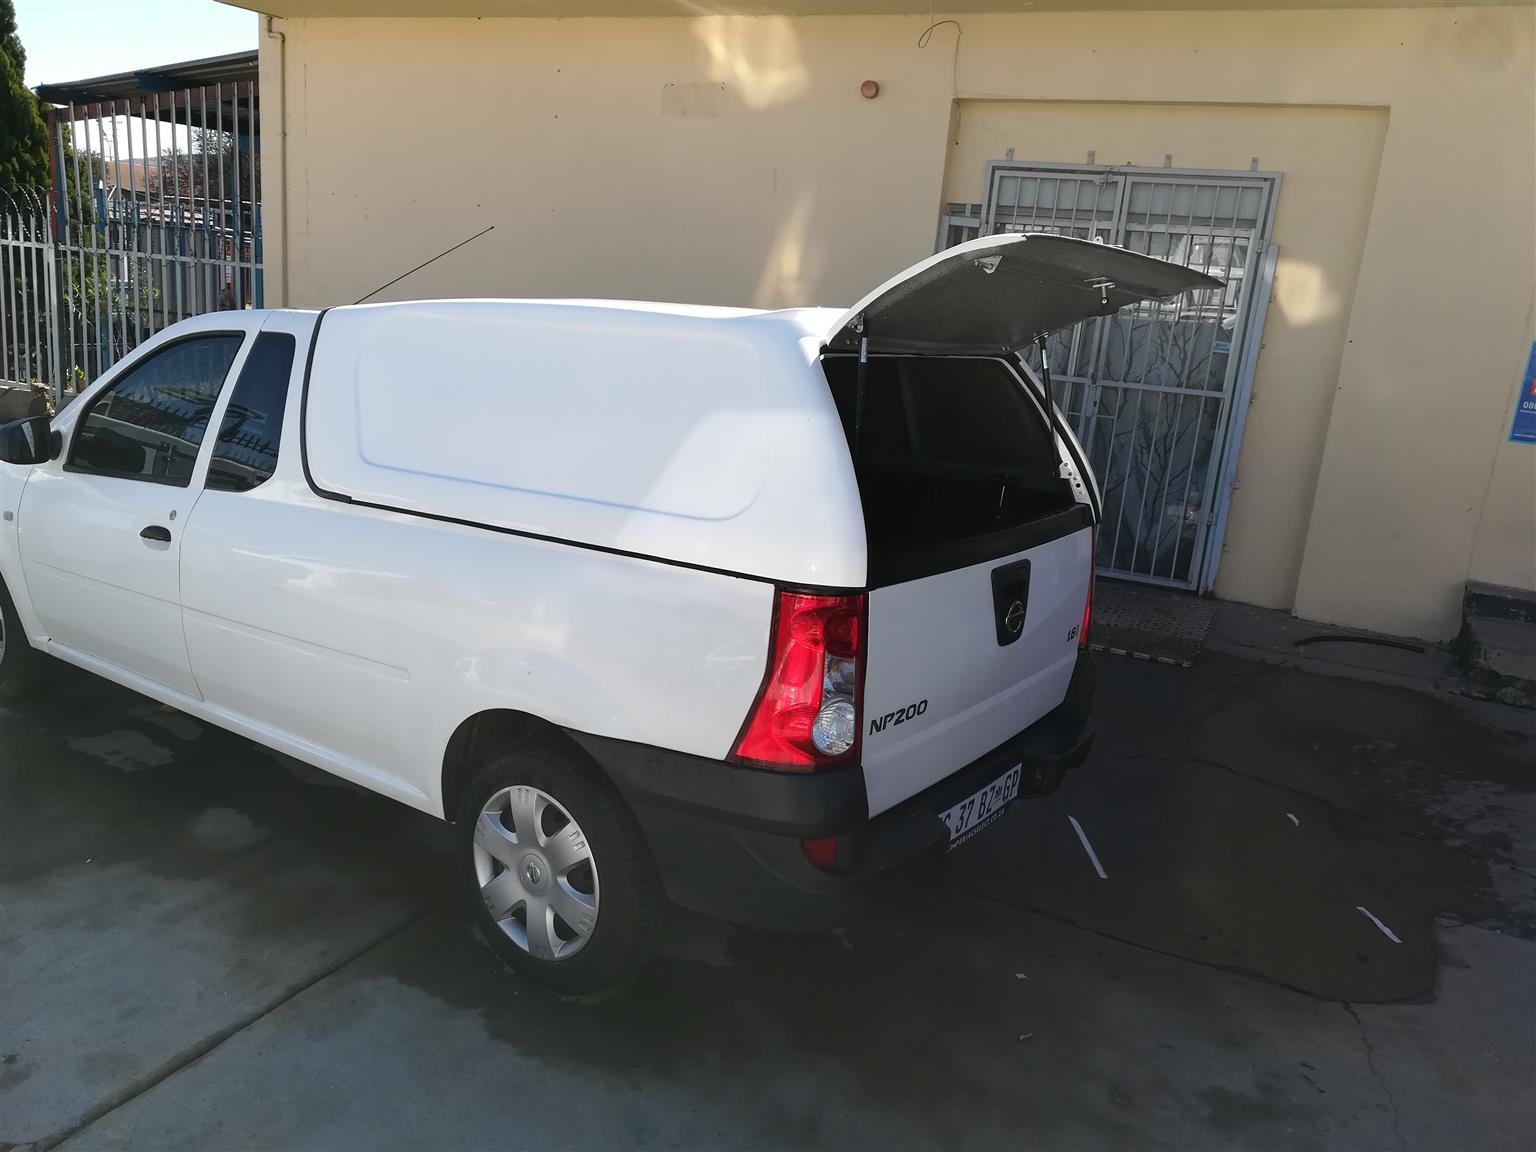 2019 Nissan NP200 Brand New Gc Blindside Bakkie Canopy for sale!!